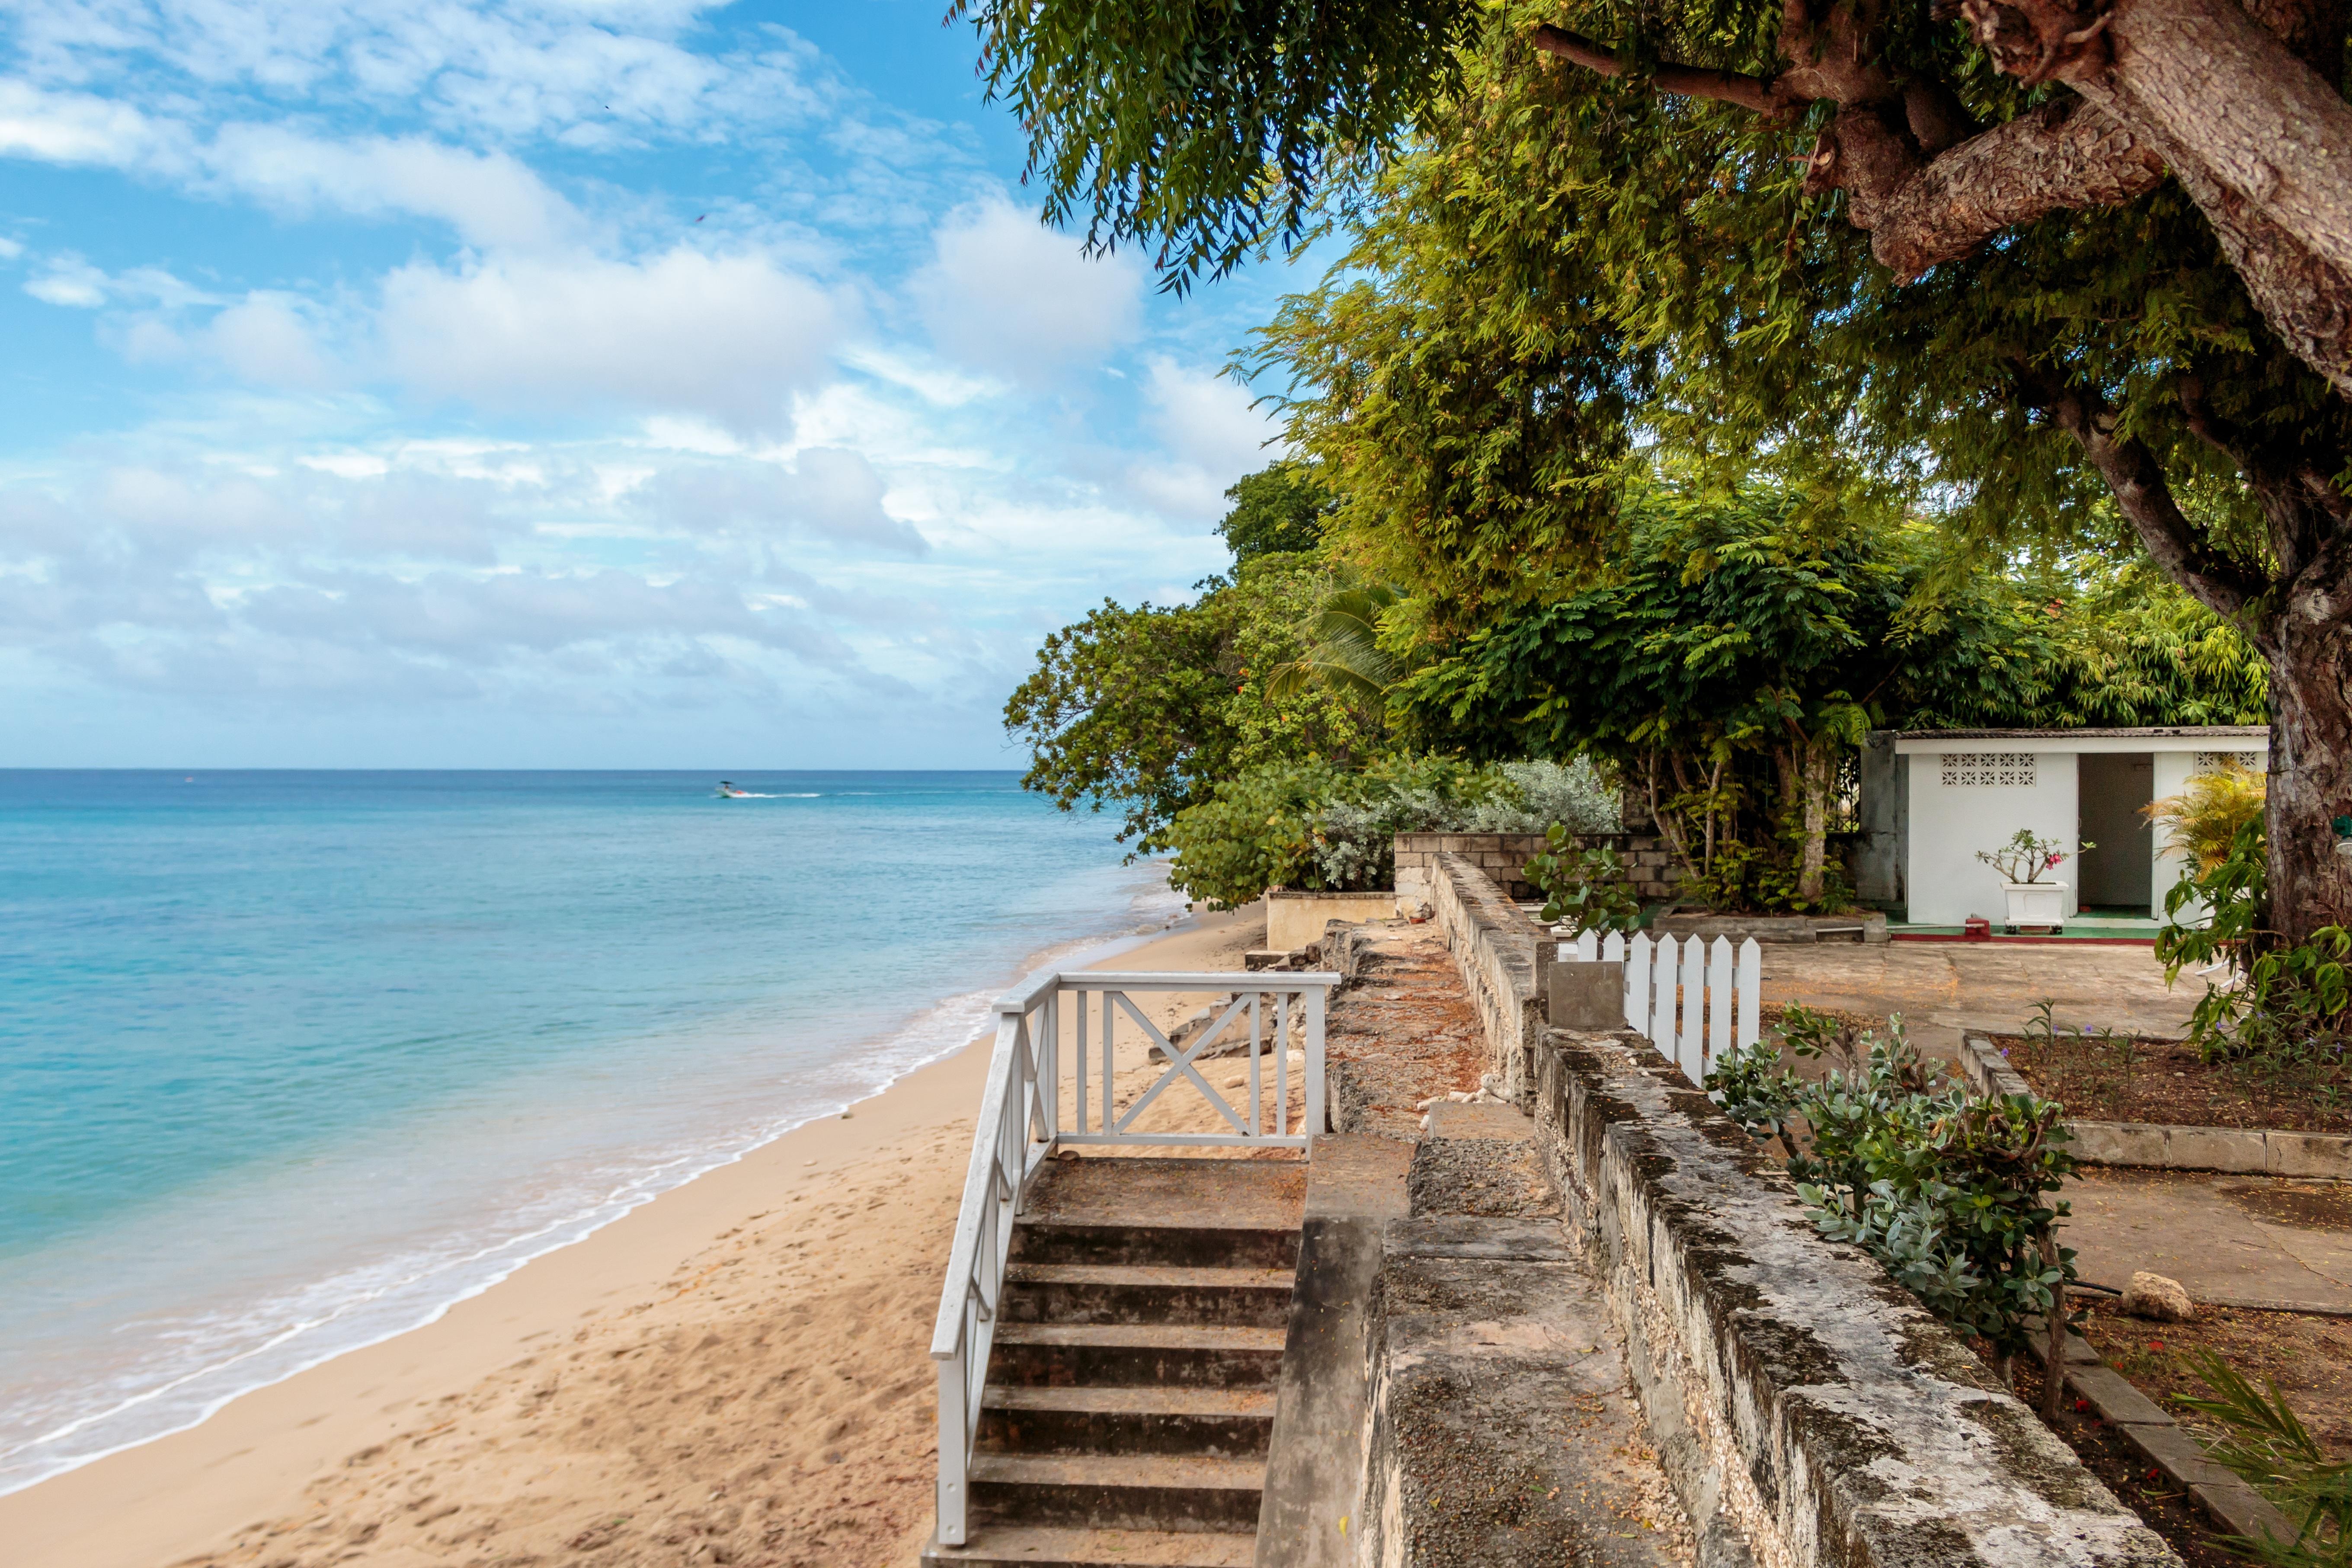 Sea Coast Walkway Vacation Stairs